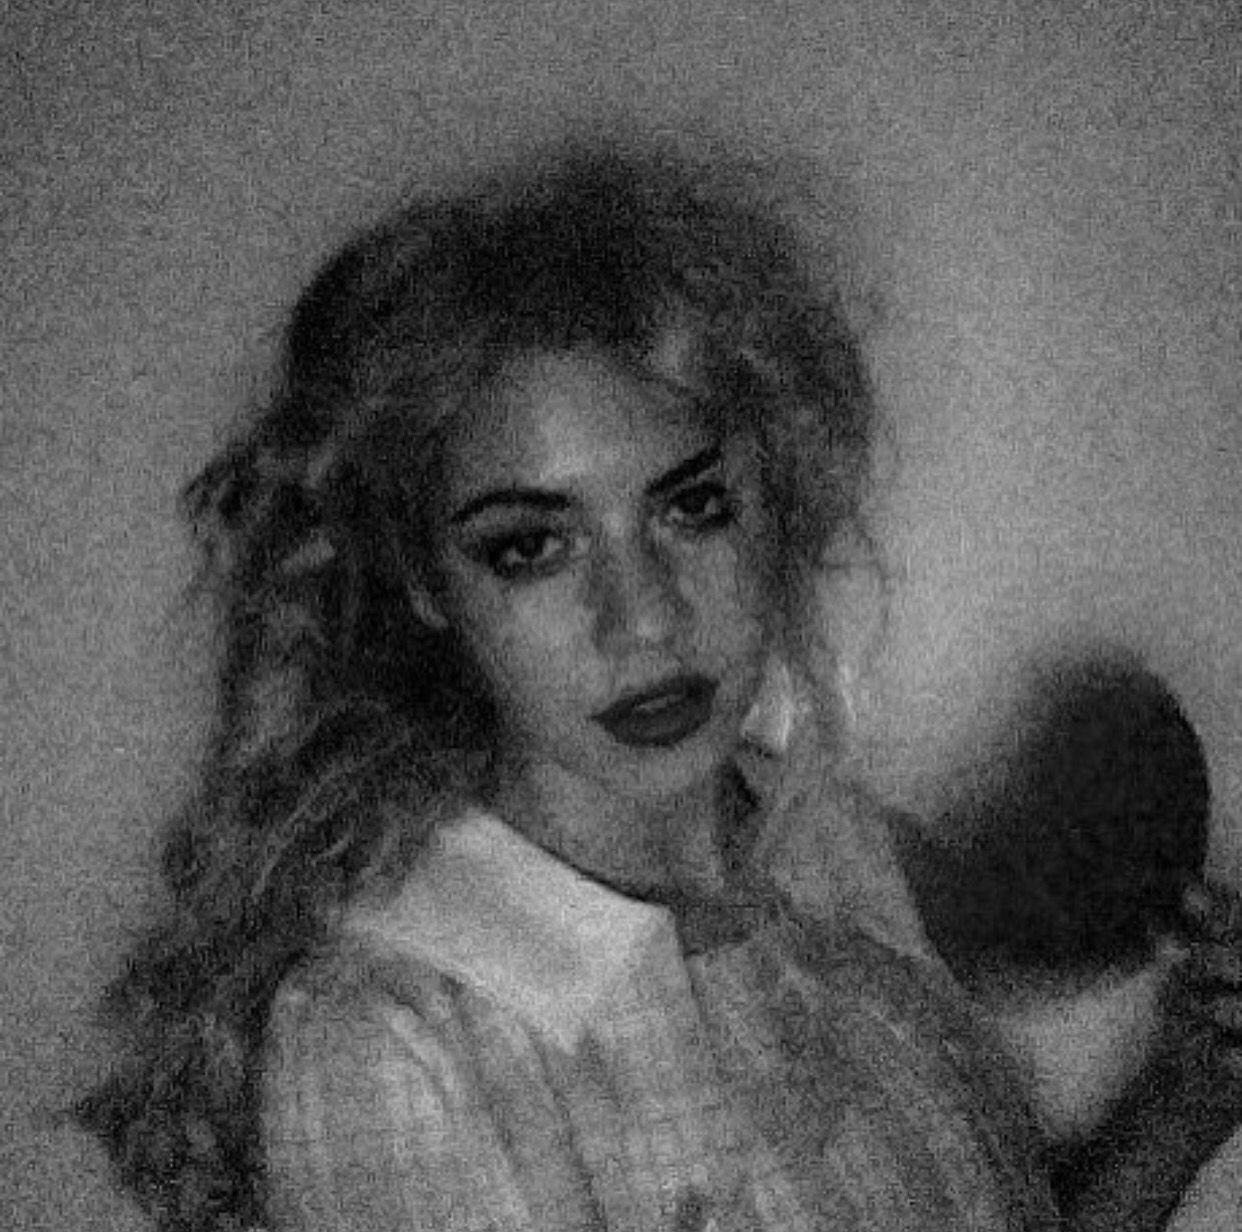 Marina and The Diamonds Marina Diamandis MATD Electra Heart Era